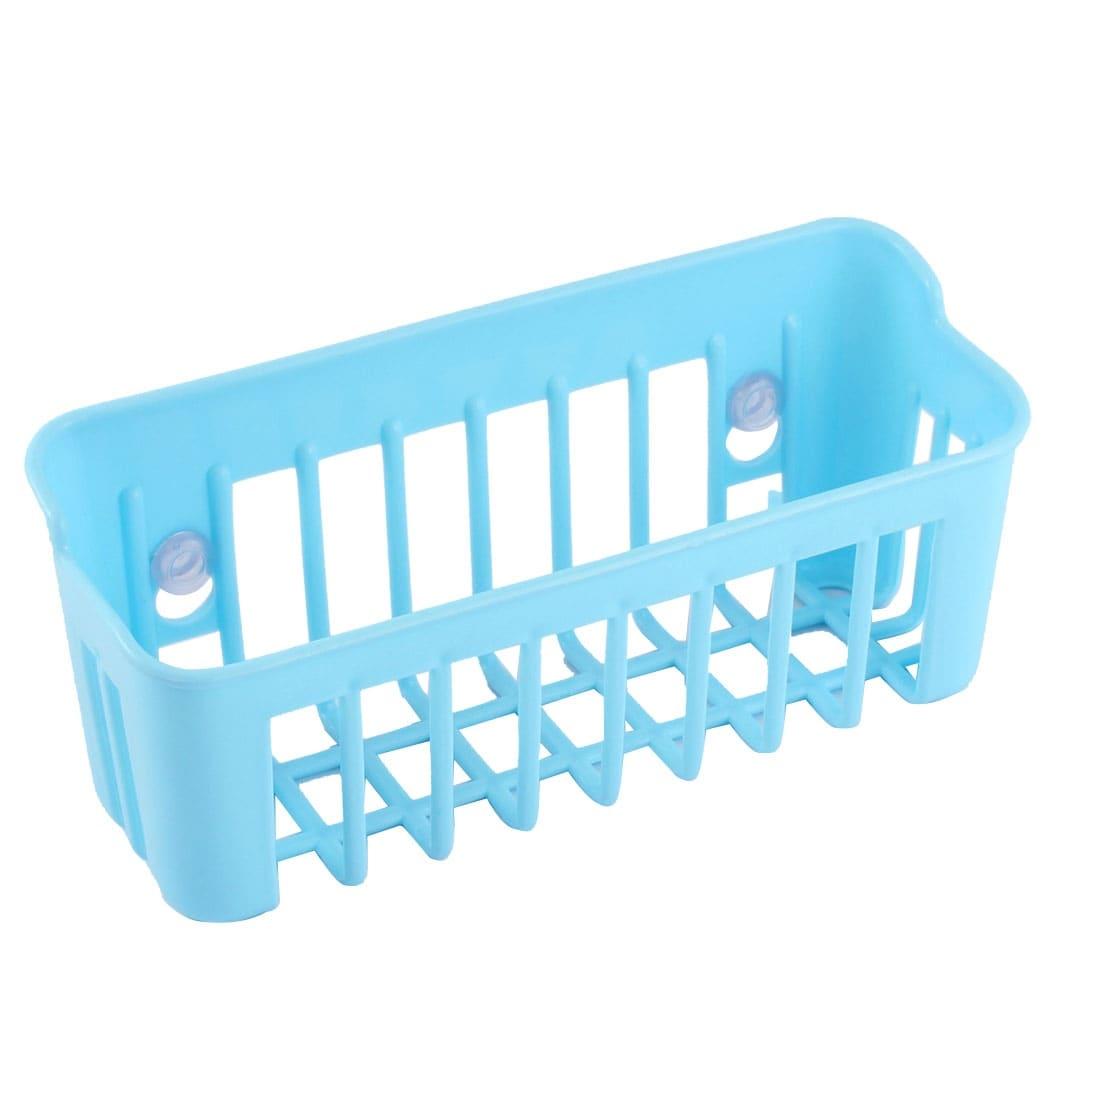 Shop Bathroom Plastic Cuboid Shape Hollow Out Suction Cup Storage ...